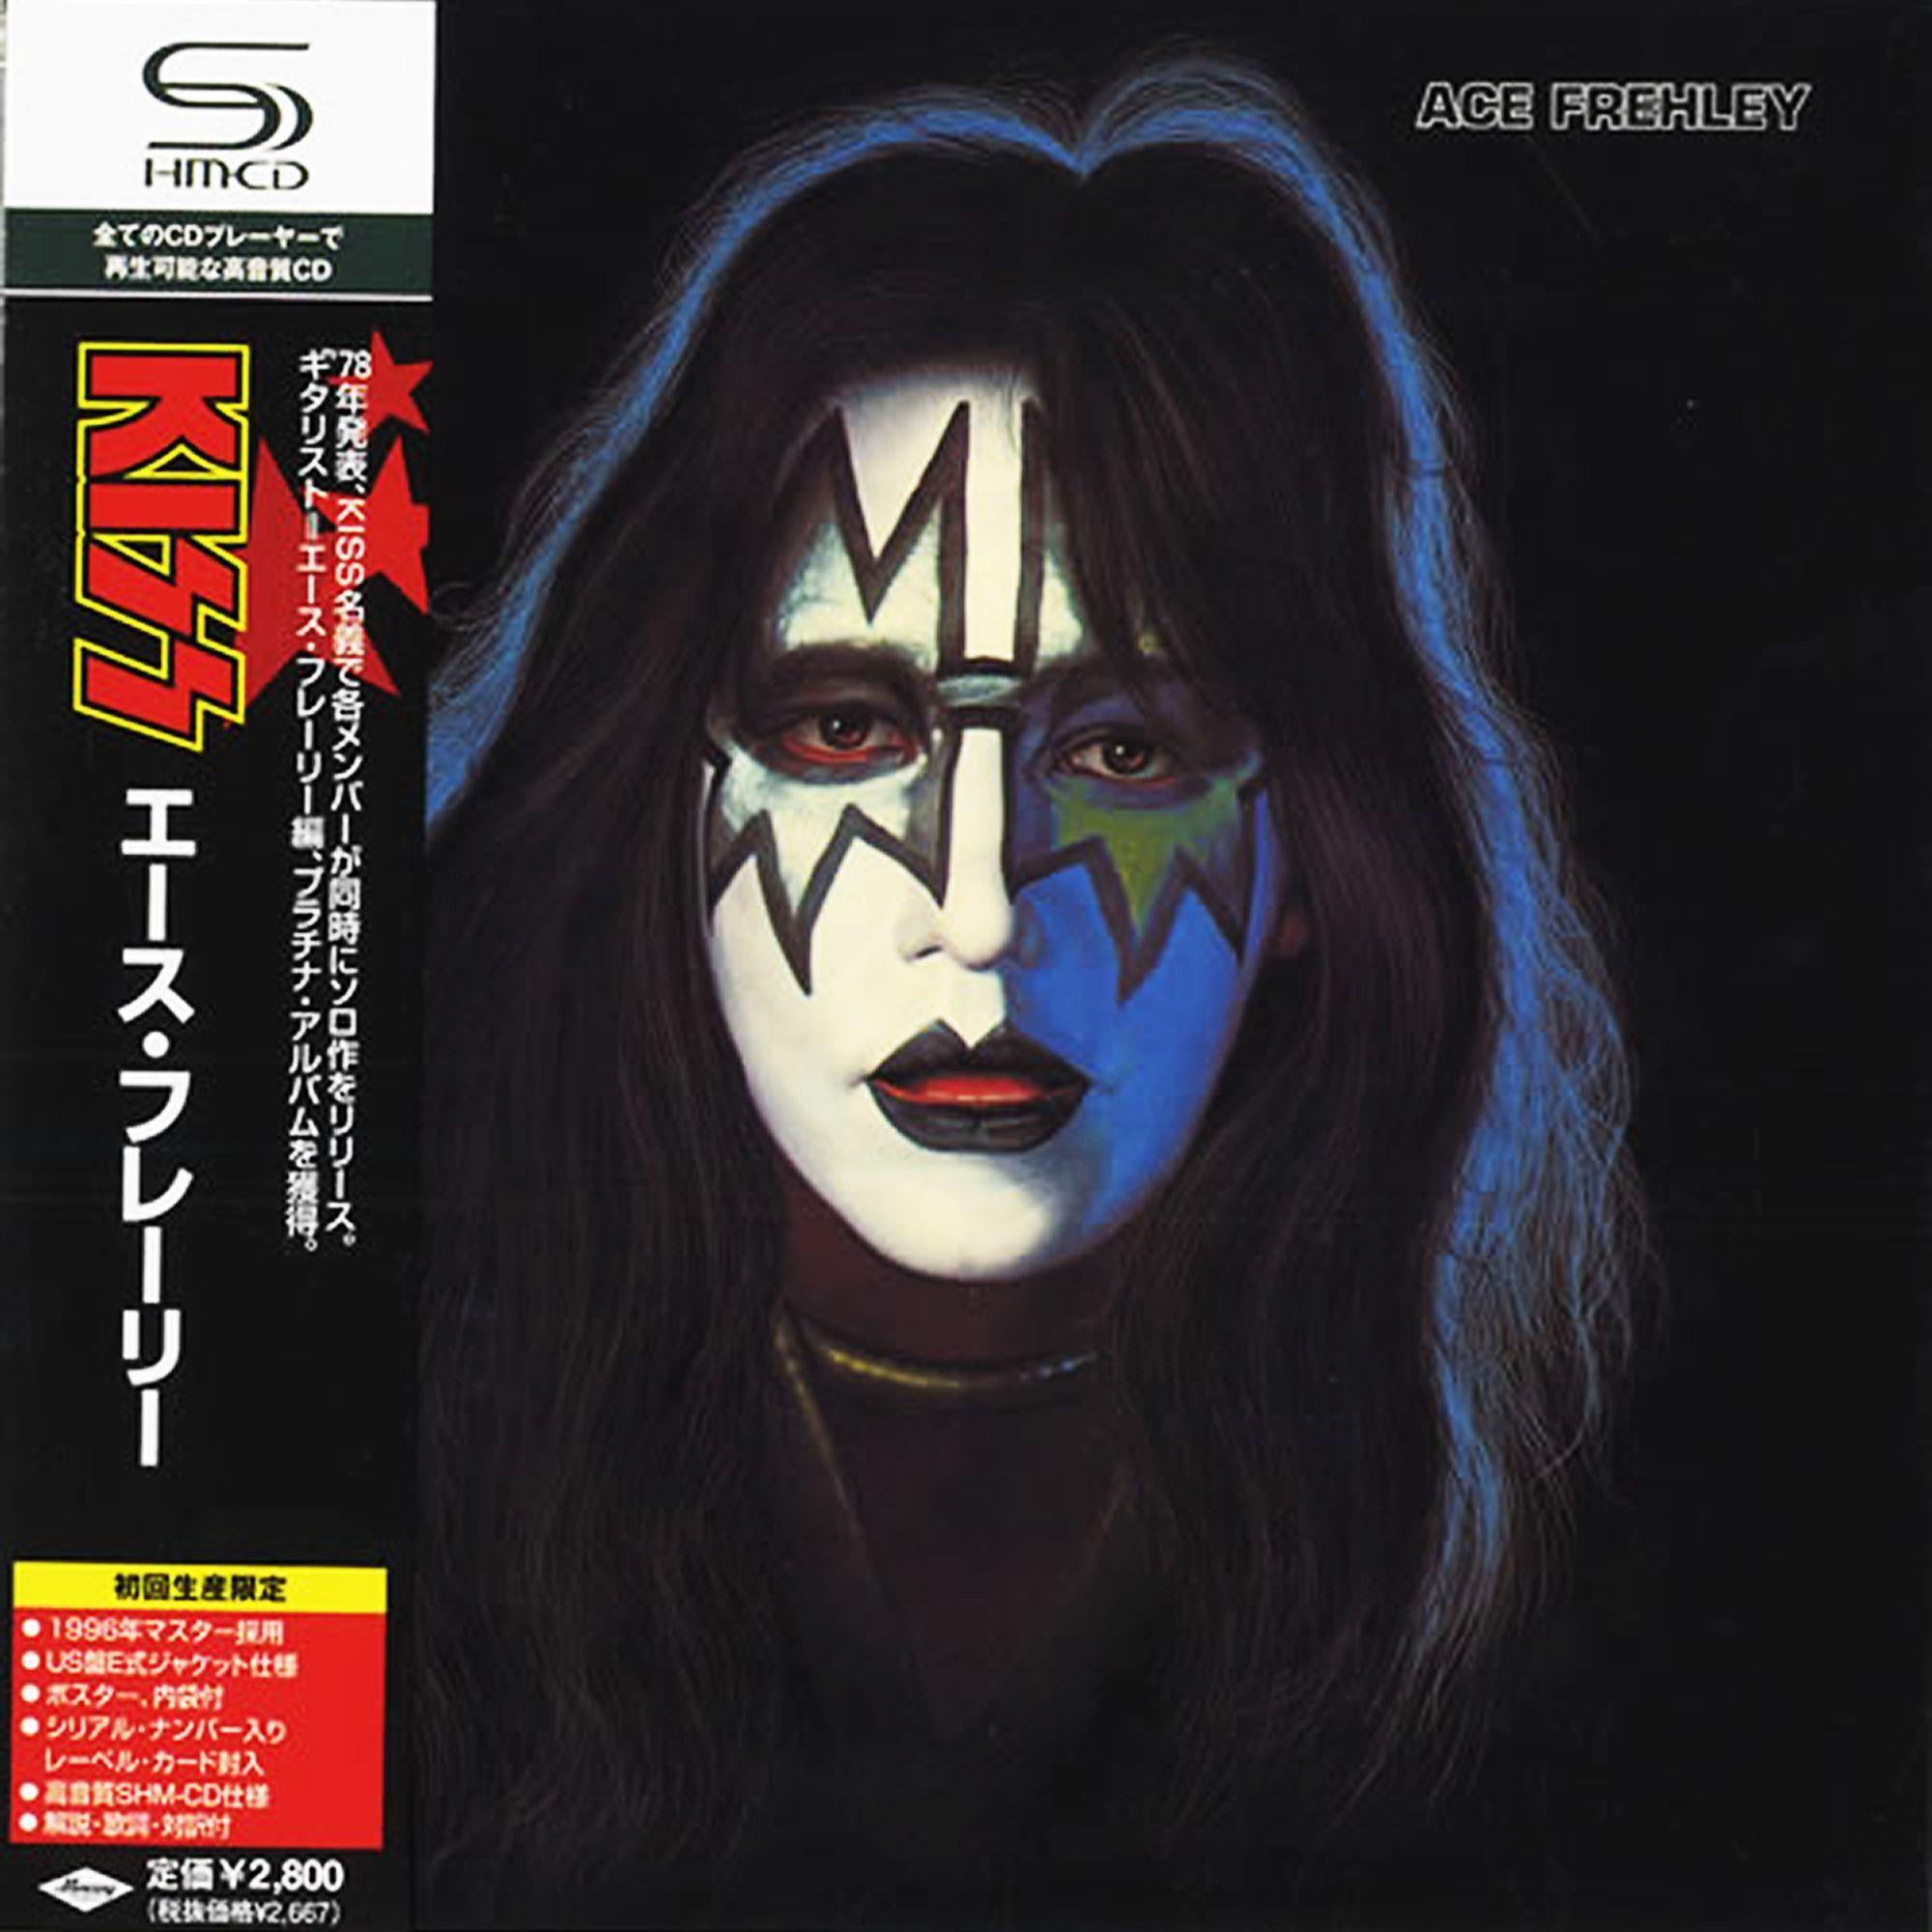 Ace Frehley - Self Titled - Japan Mini LP SHM - UICY-93531 - CD